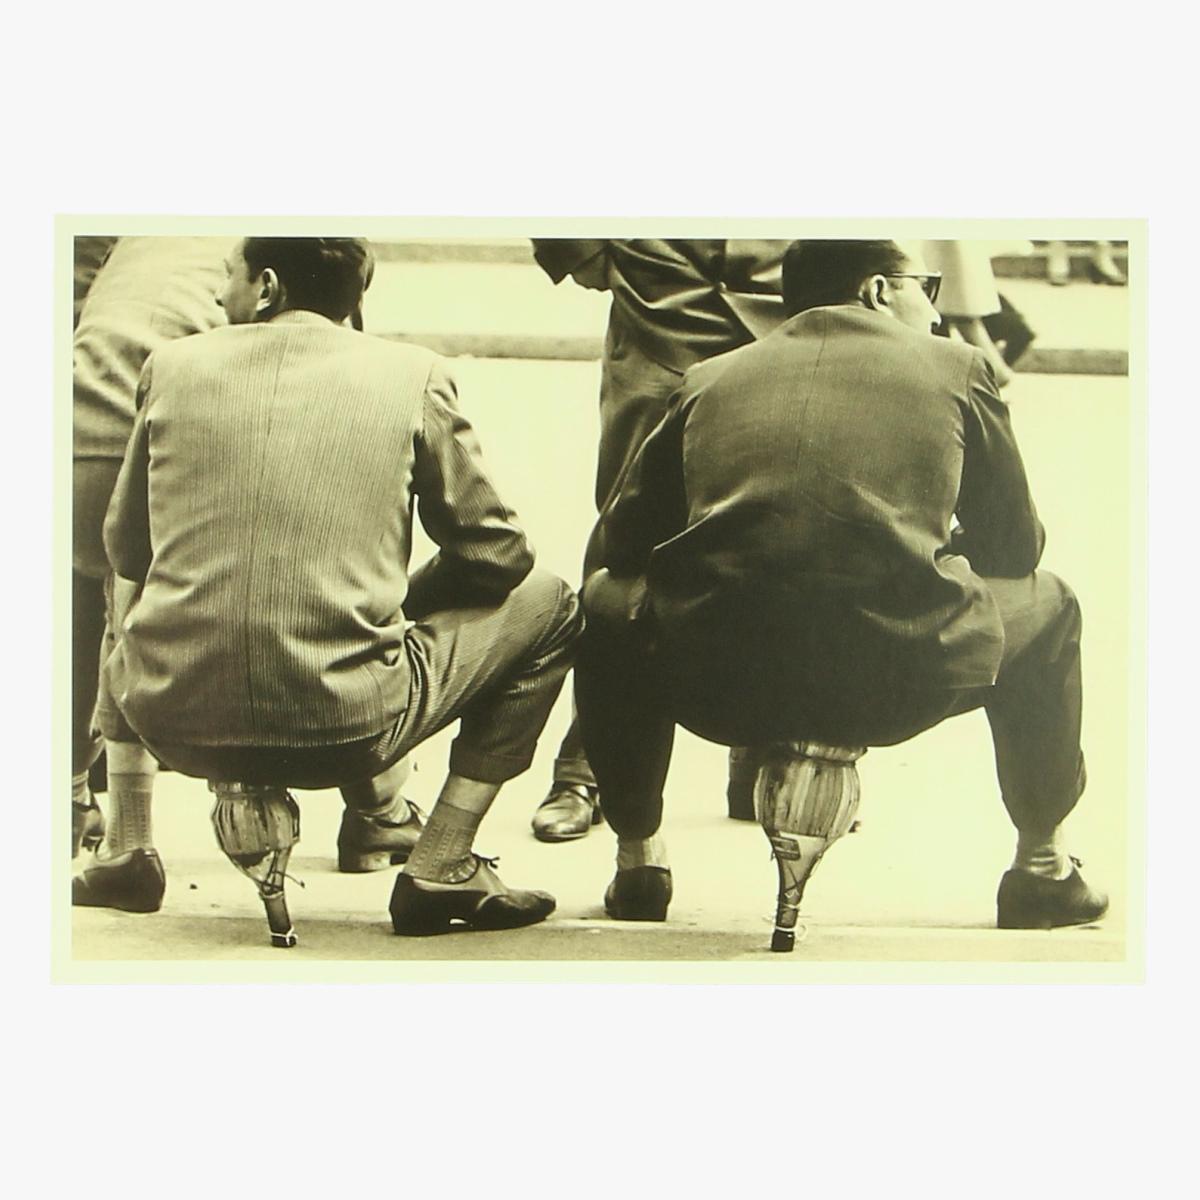 "Afbeeldingen van postkaart Mario De Biasi"" SEDUTI SUI FIASCHI ,MILANO "" 1949"